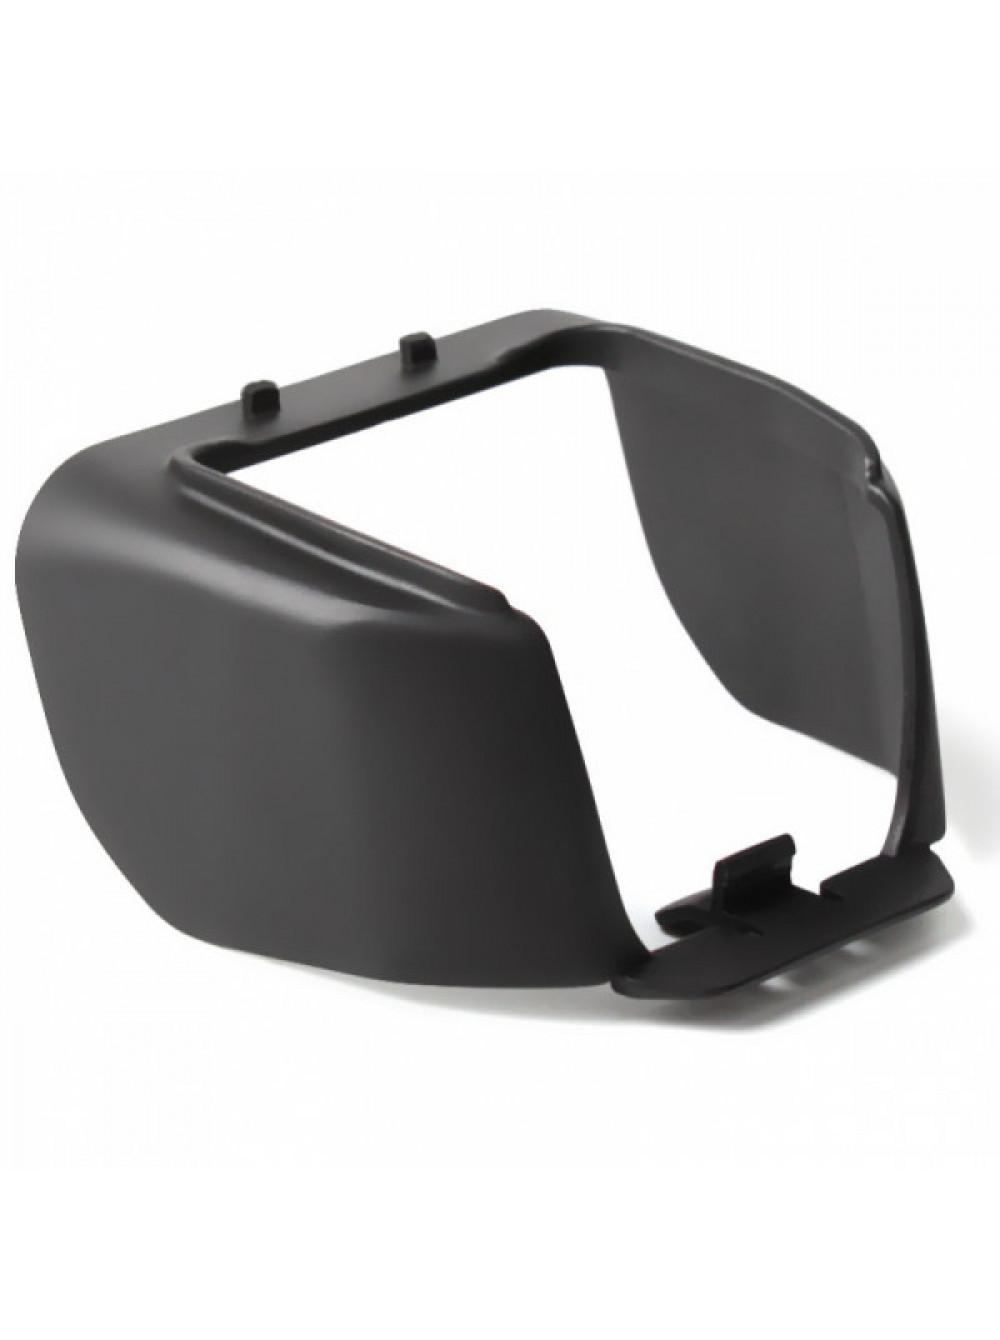 Защита подвеса и камеры DJI Mavic 2 Pro / Zoom Sunnylife